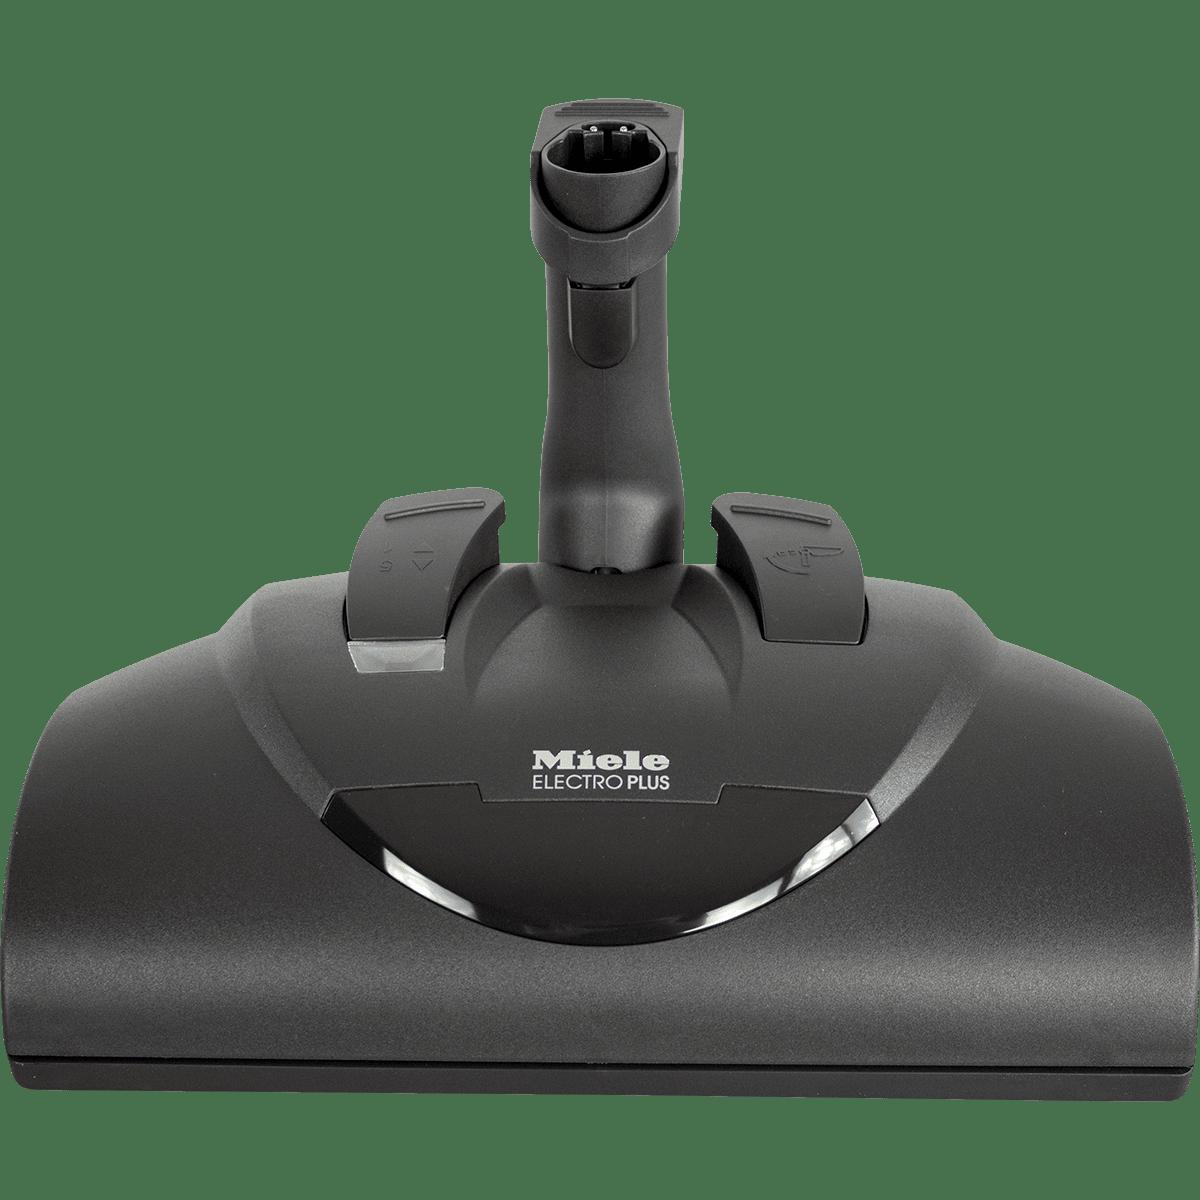 Miele Seb 228 Electro Plus Powerbrush Free Shipping